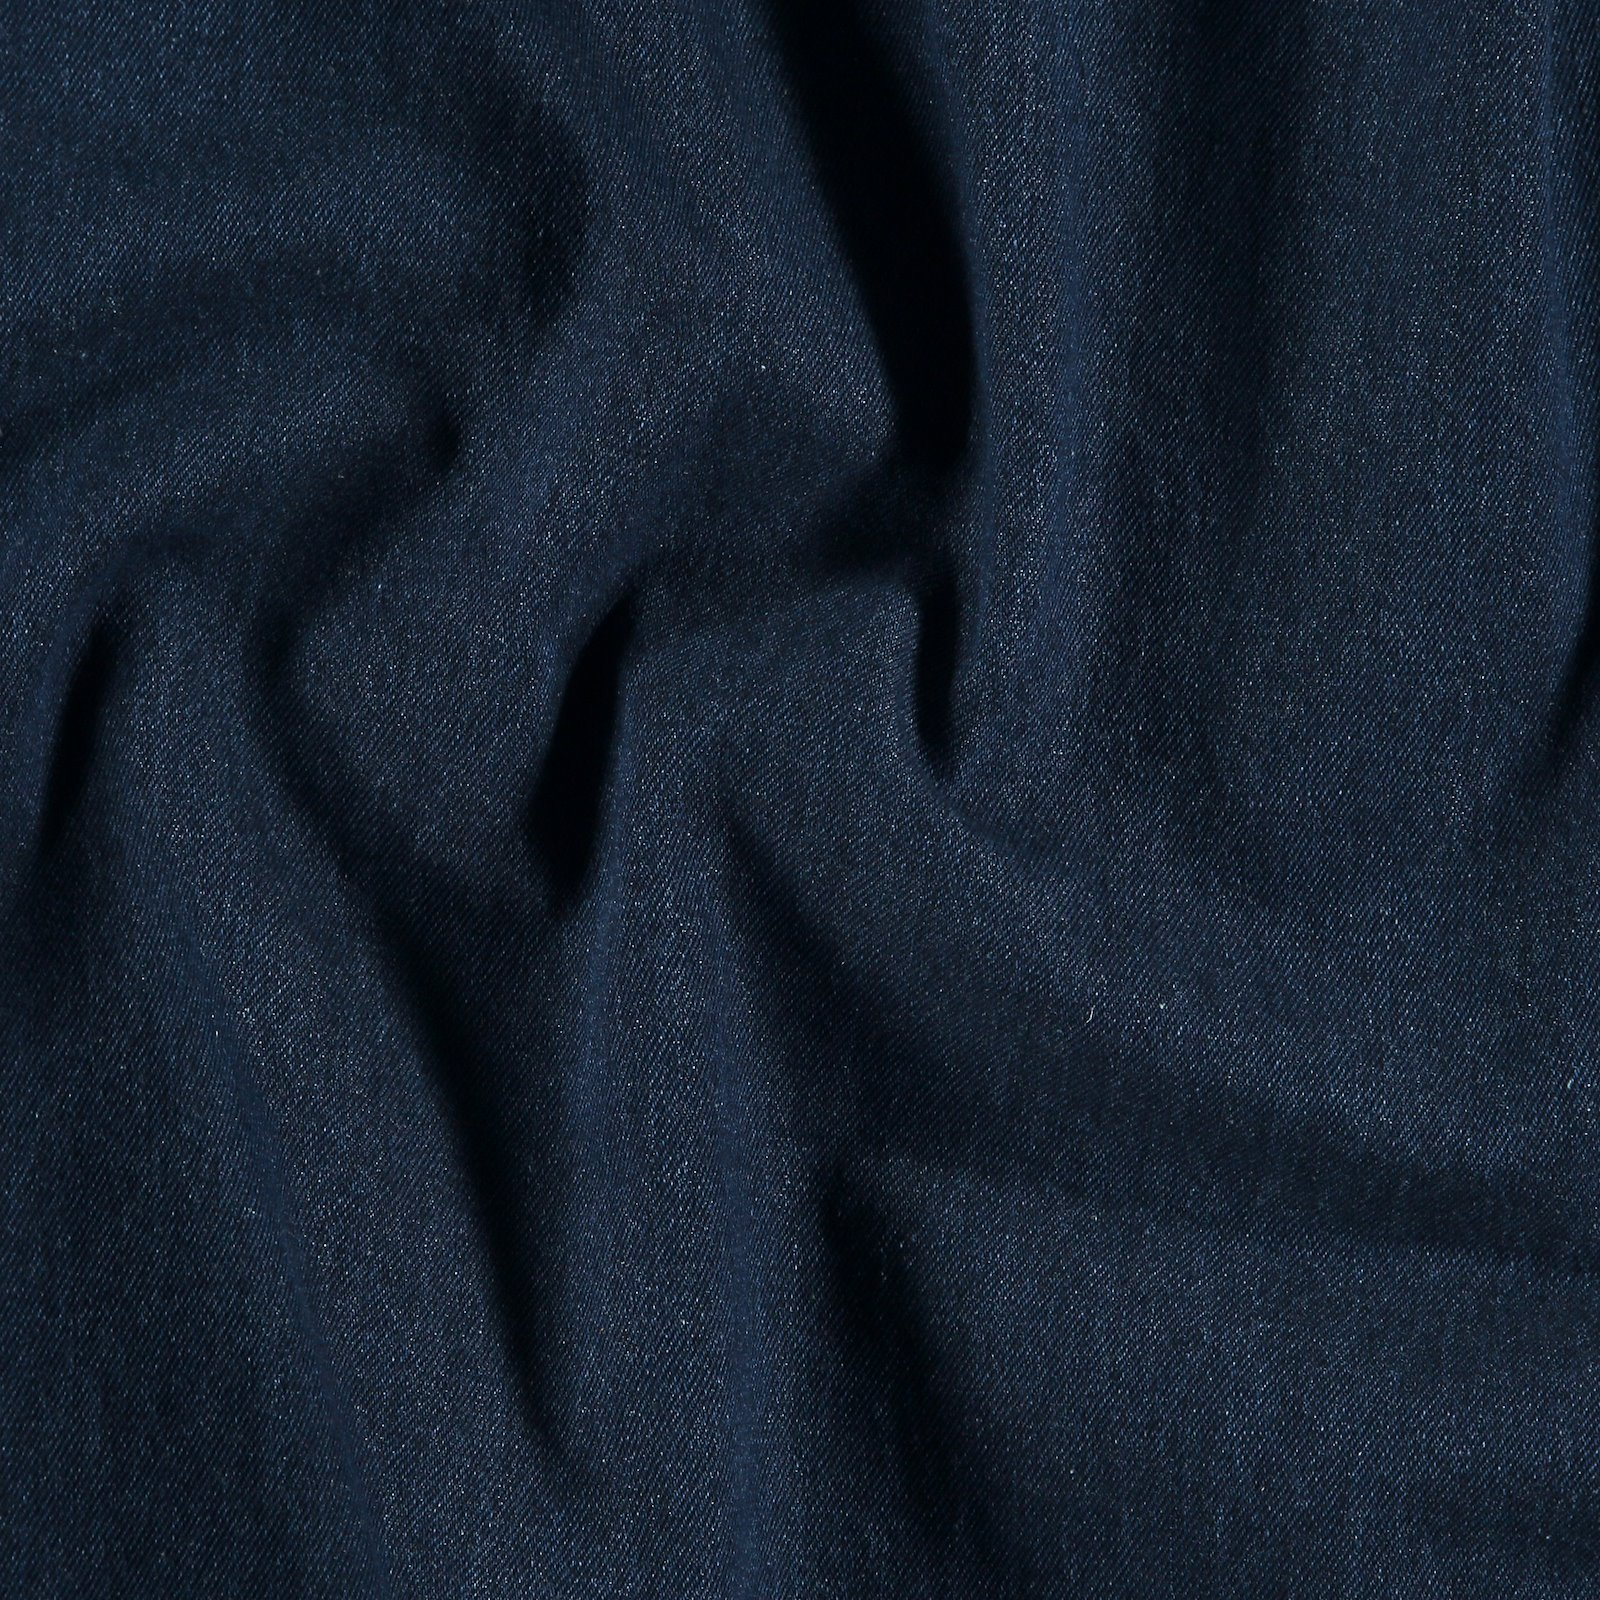 Soft washed denim dark blue 10oz